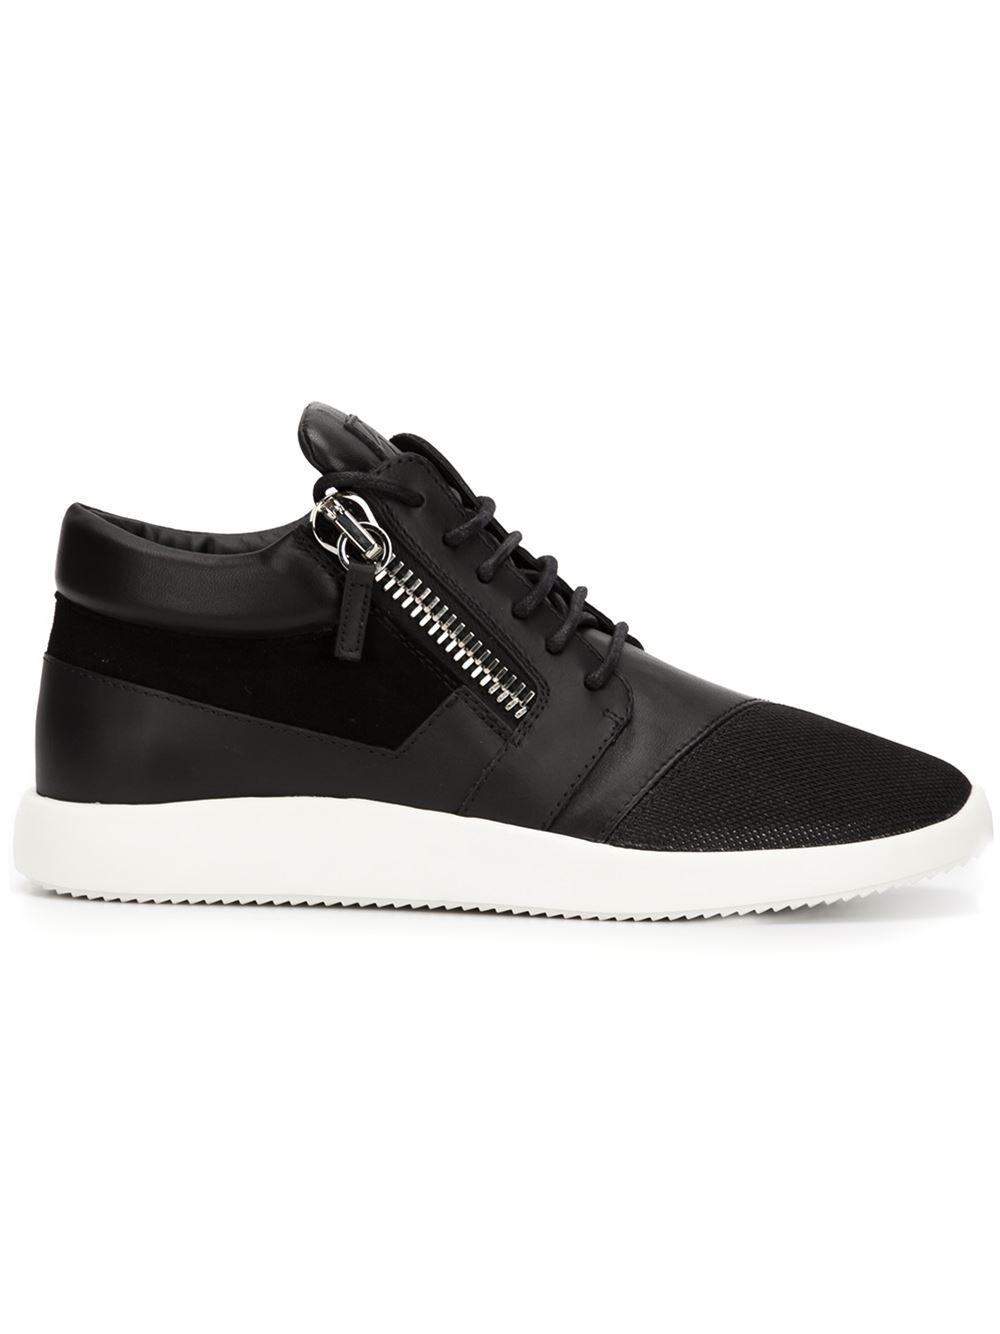 Sneakers zanotti homme promo